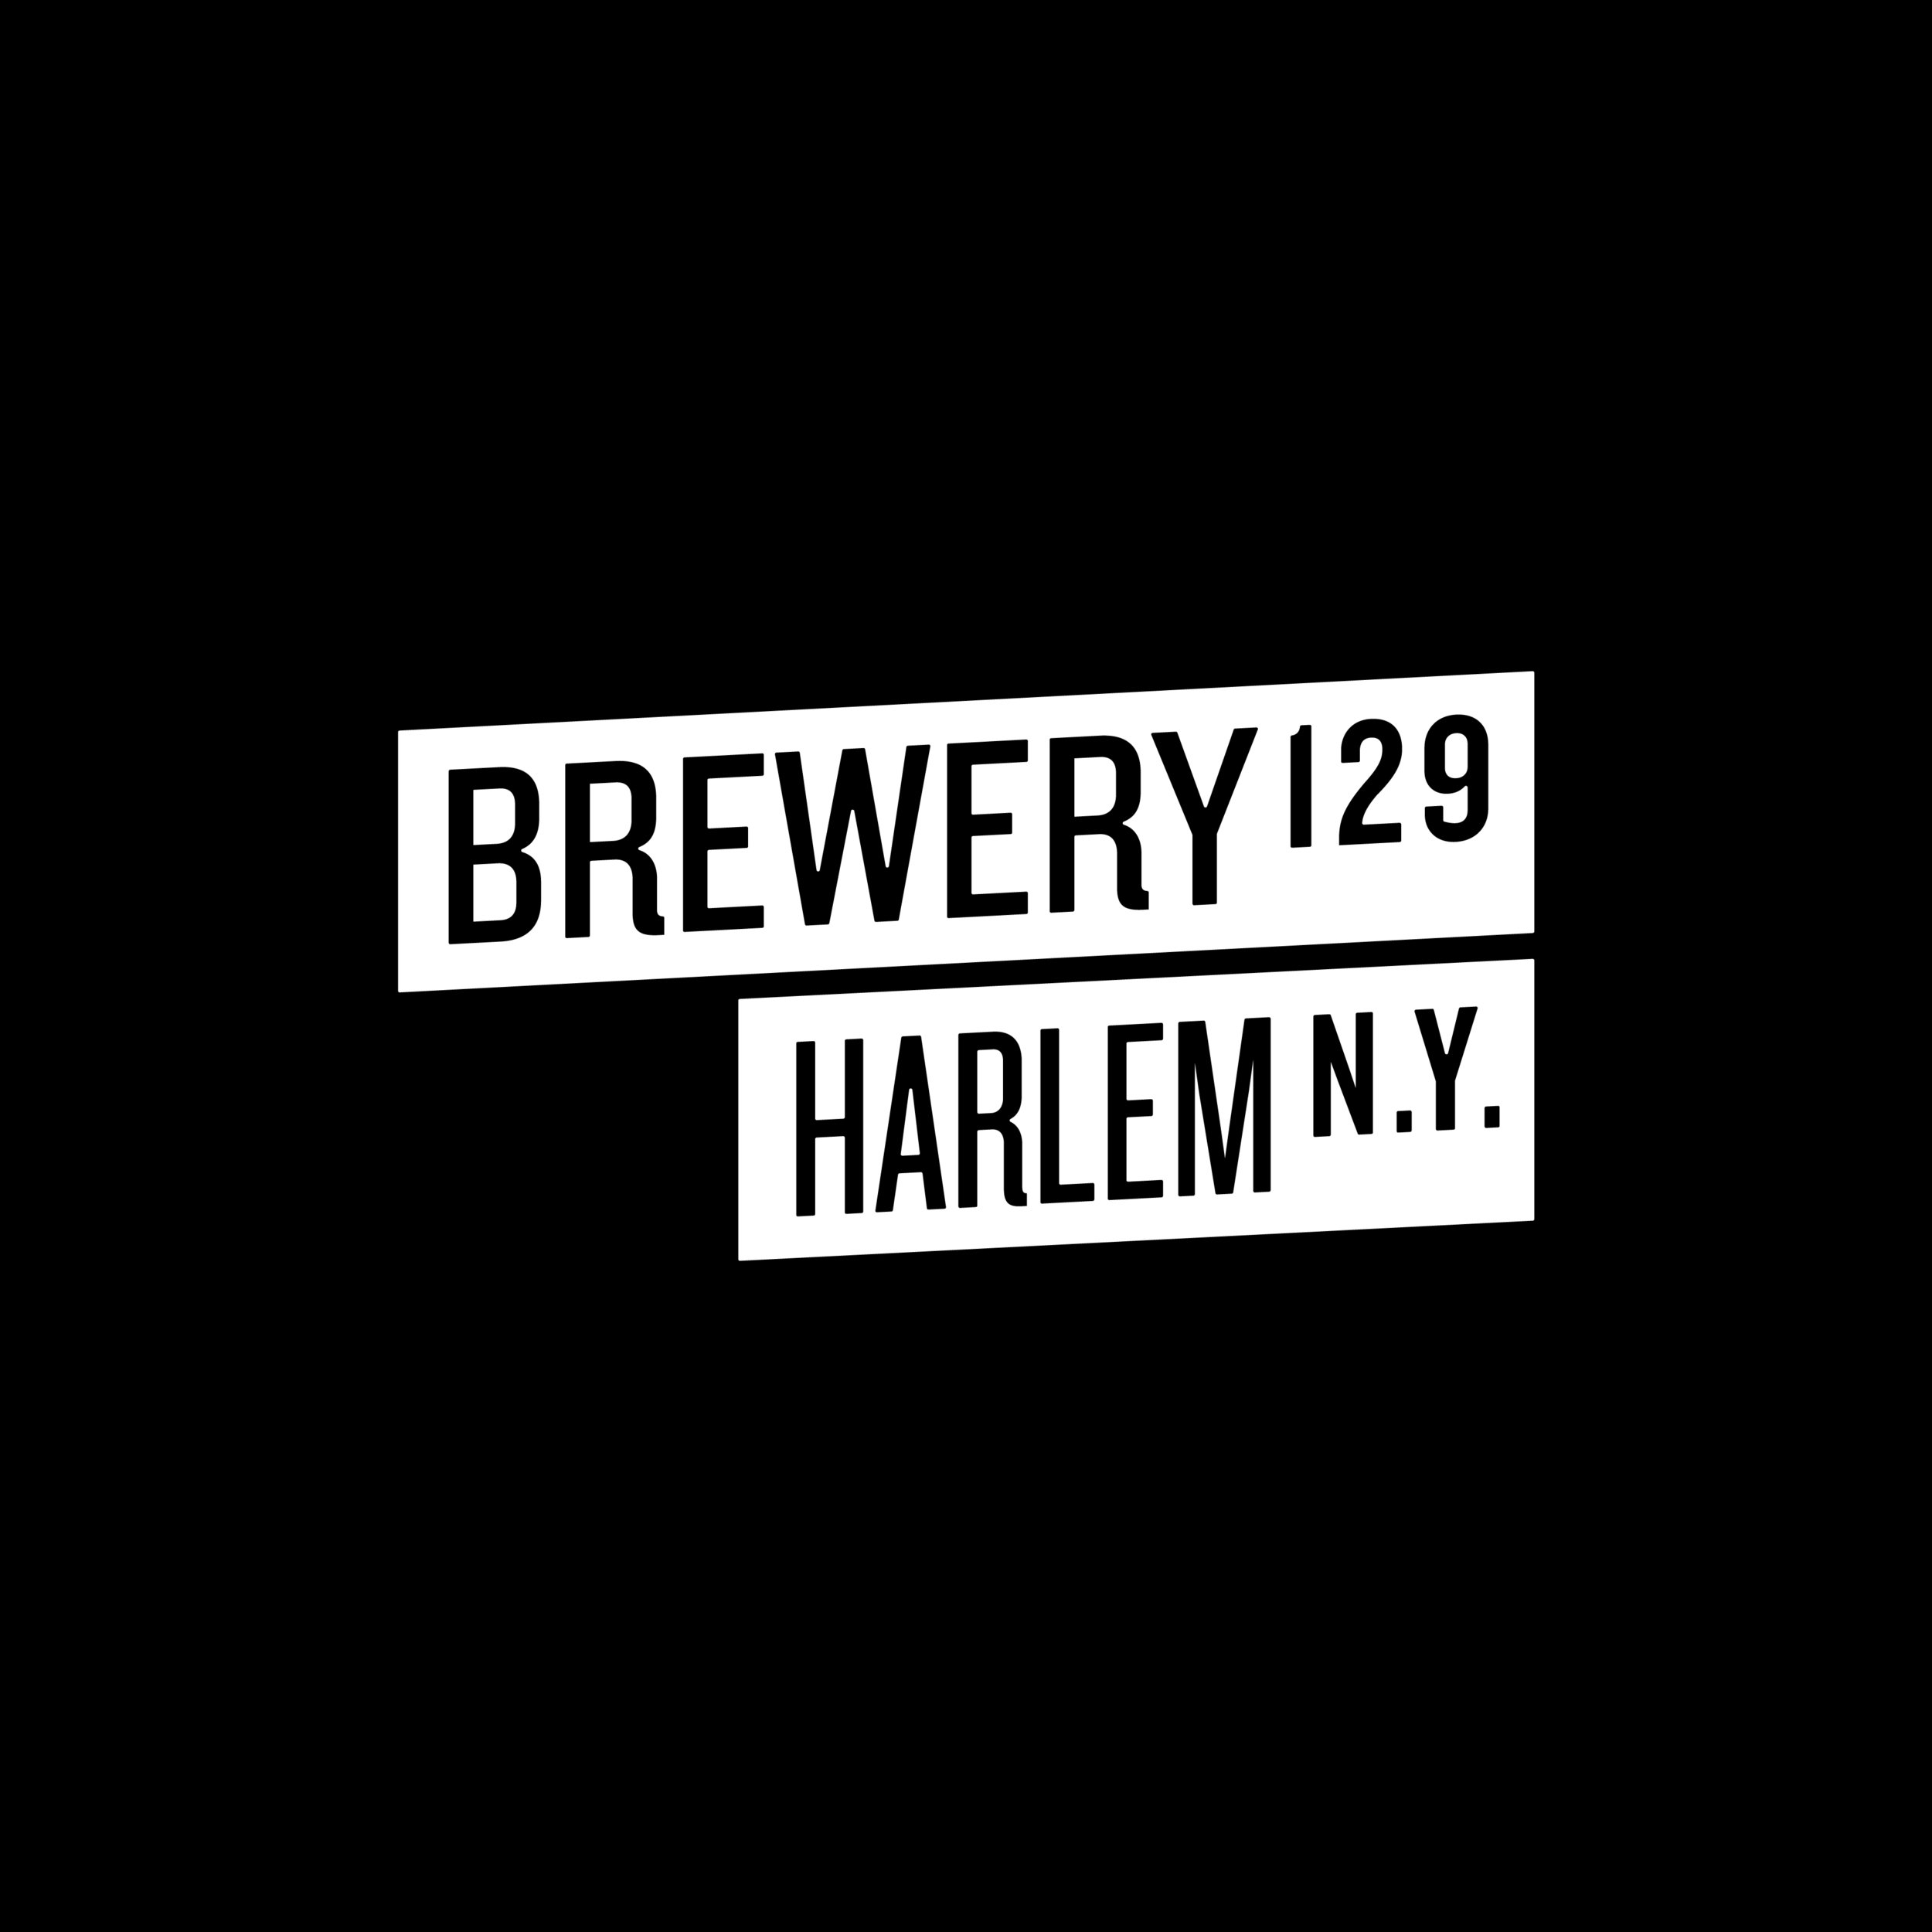 Brewery129 Logos-02.jpg